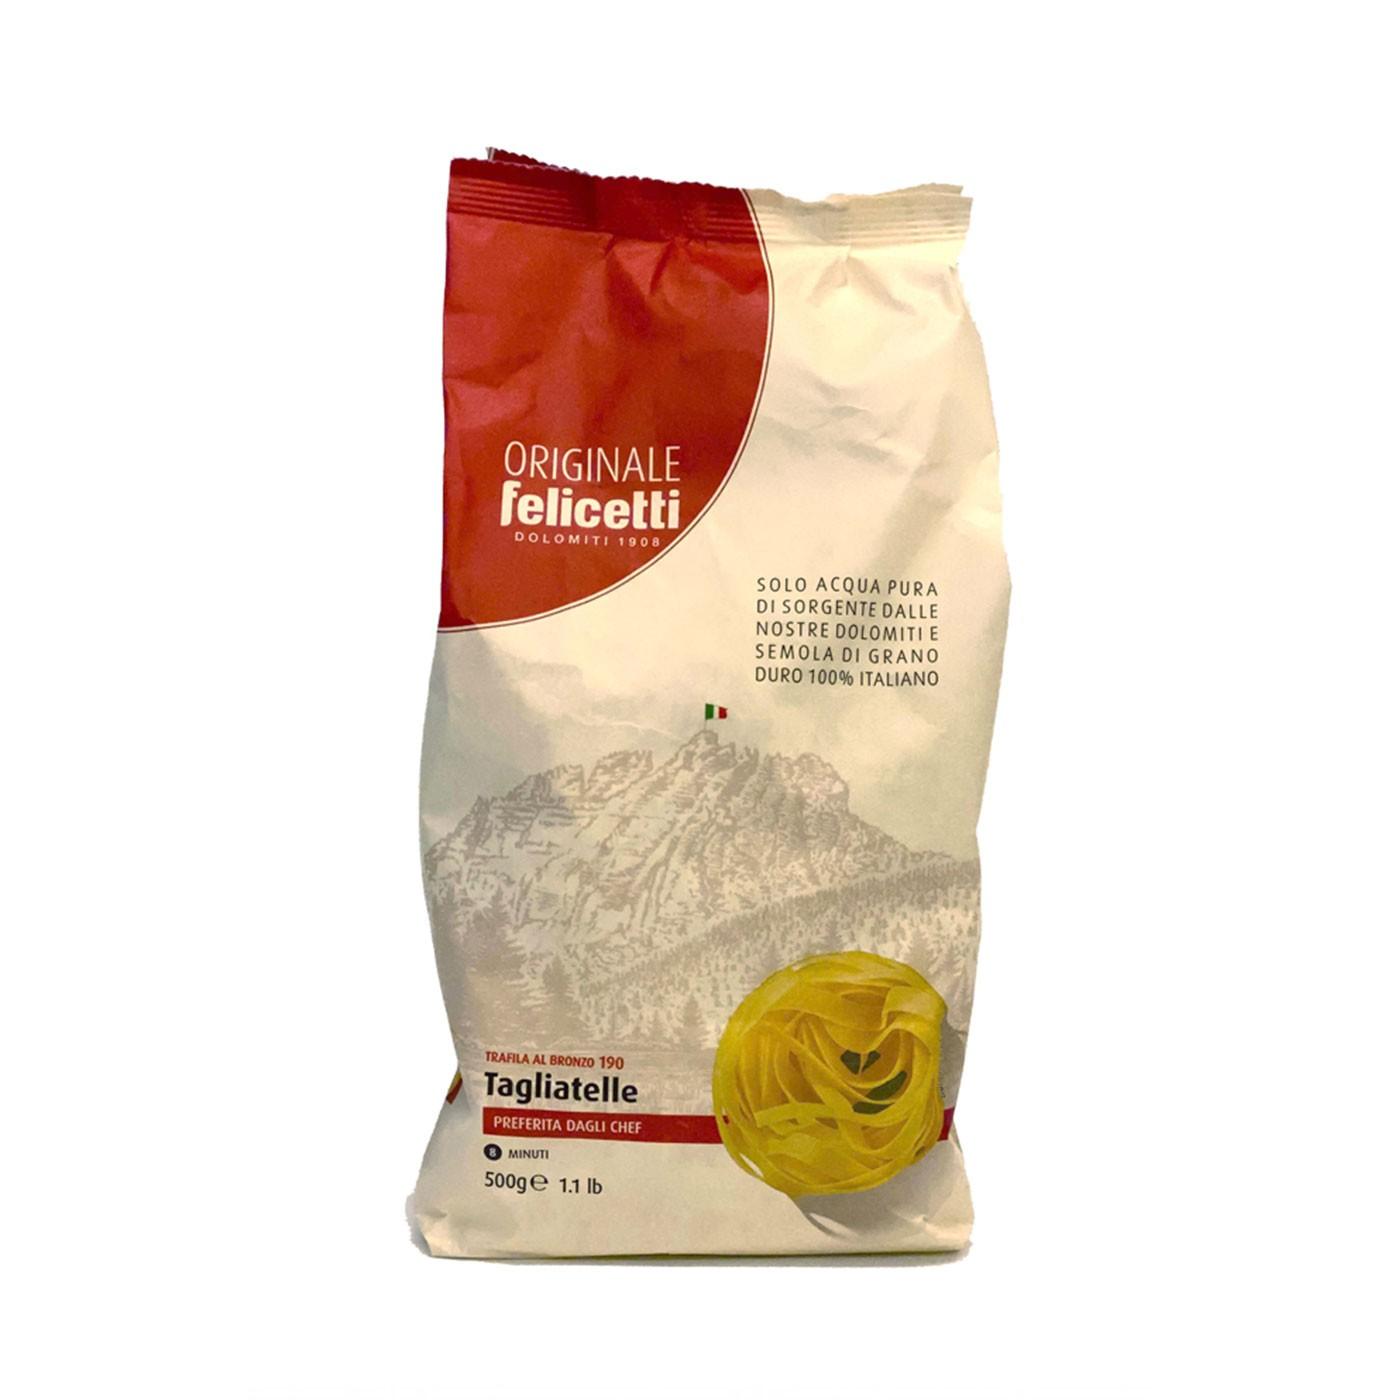 Tagliatelle 17.6 oz - Felicetti | Eataly.com